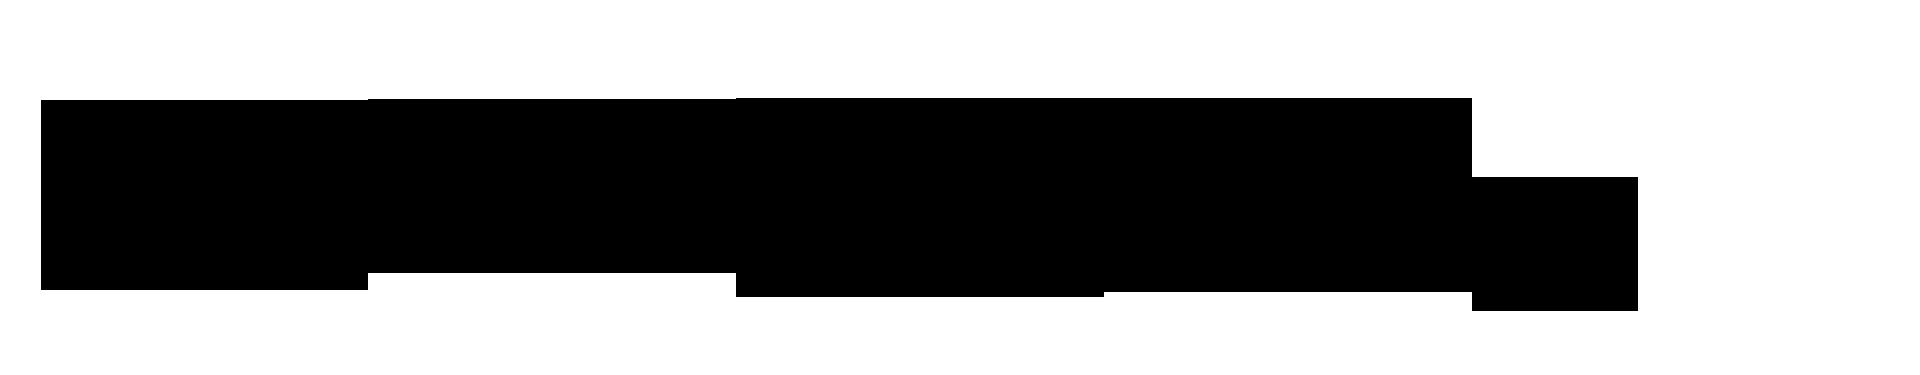 PNG Tgif - 60357